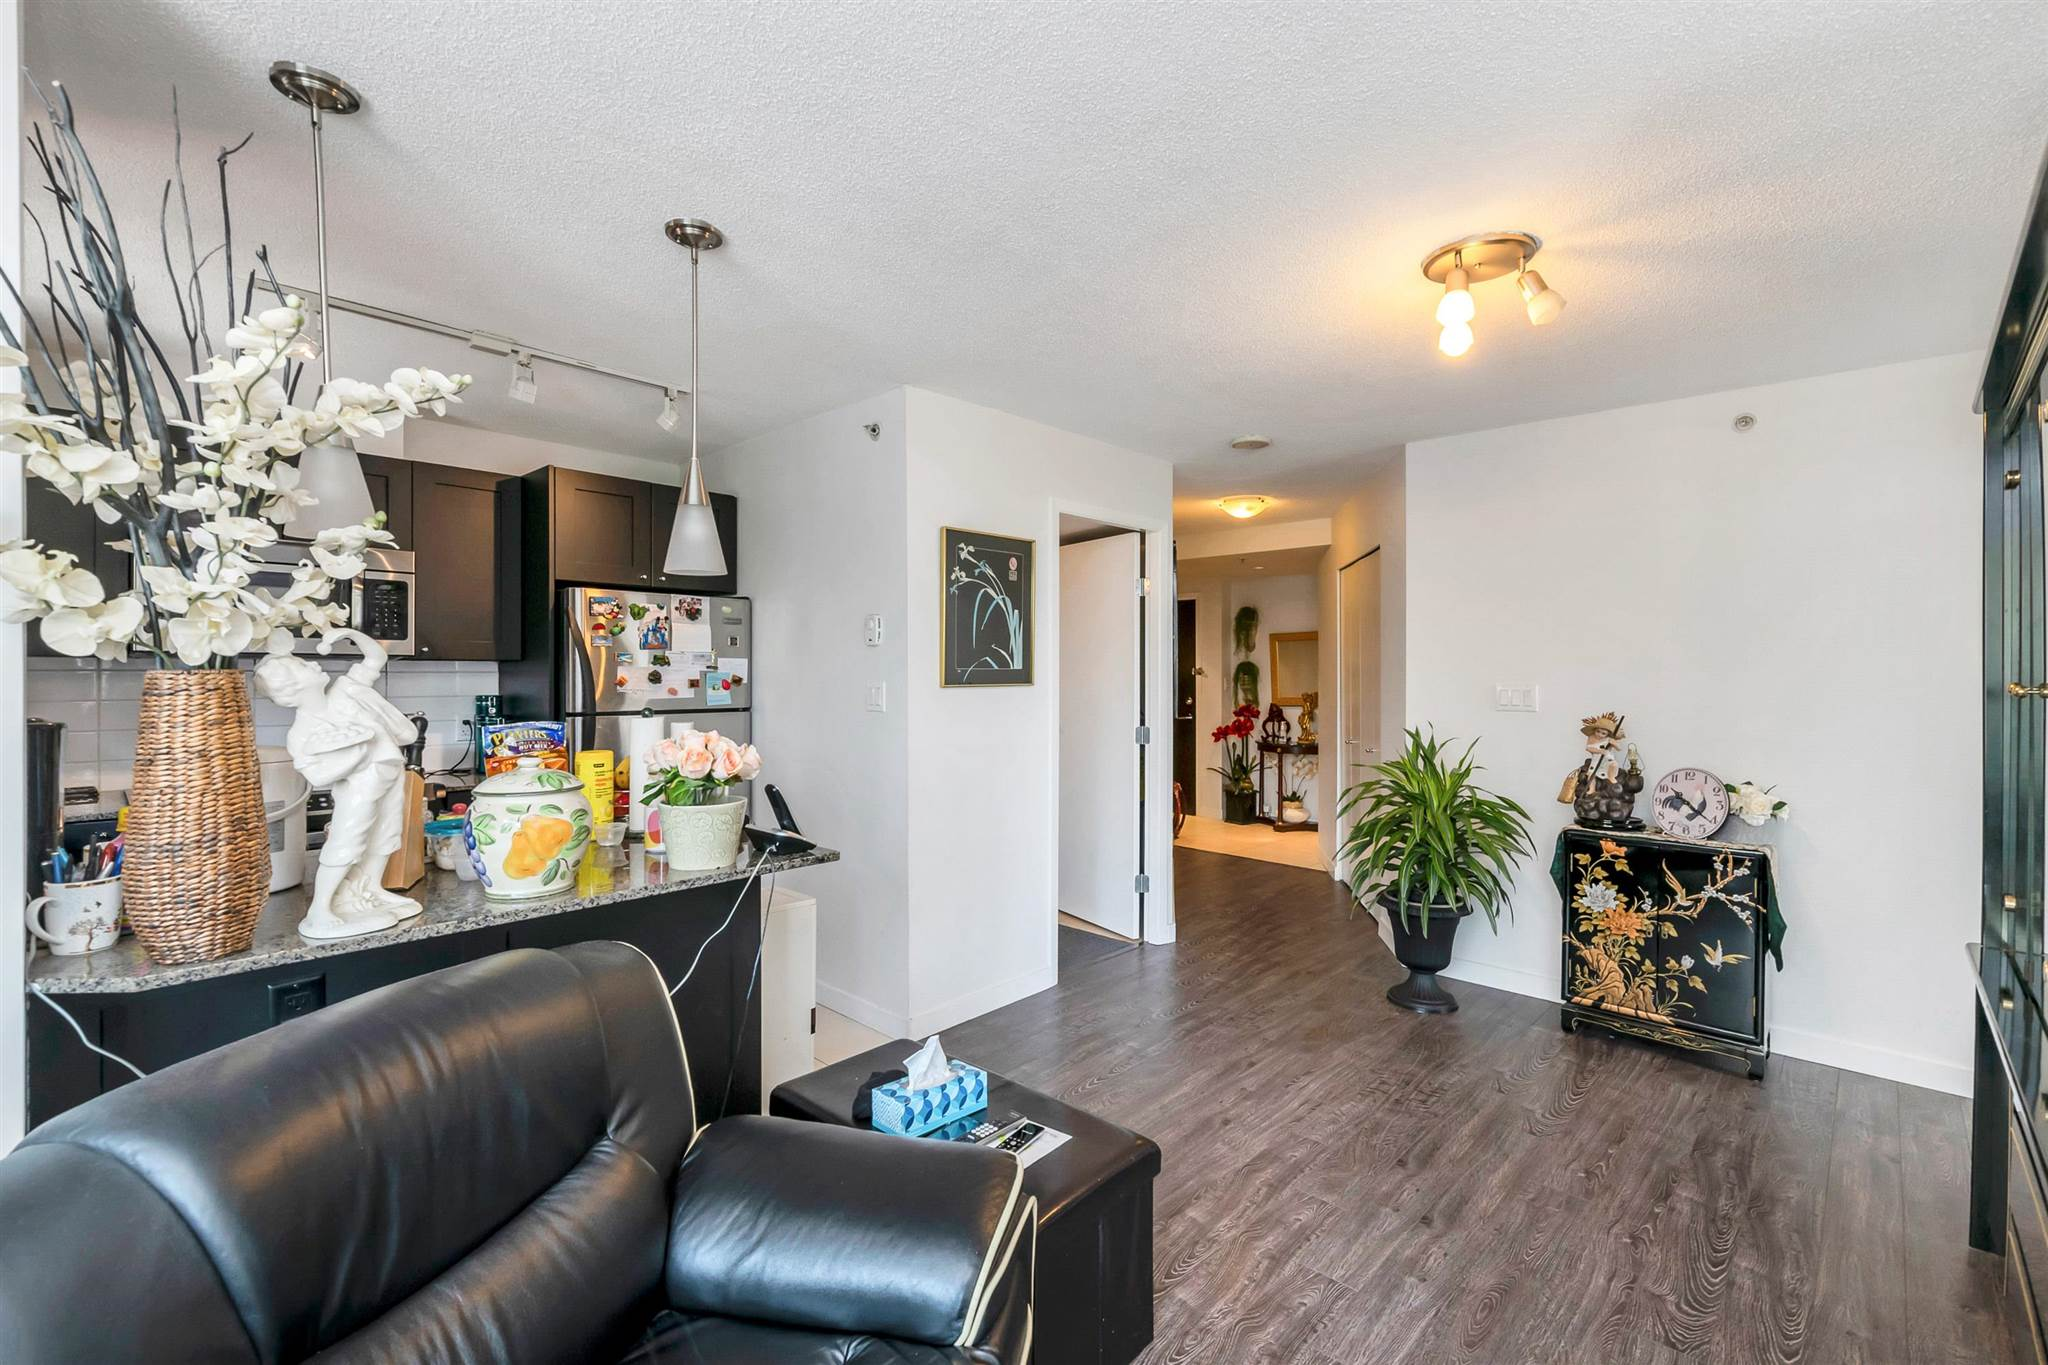 205 7225 ACORN AVENUE - Highgate Apartment/Condo for sale, 2 Bedrooms (R2606454) - #3